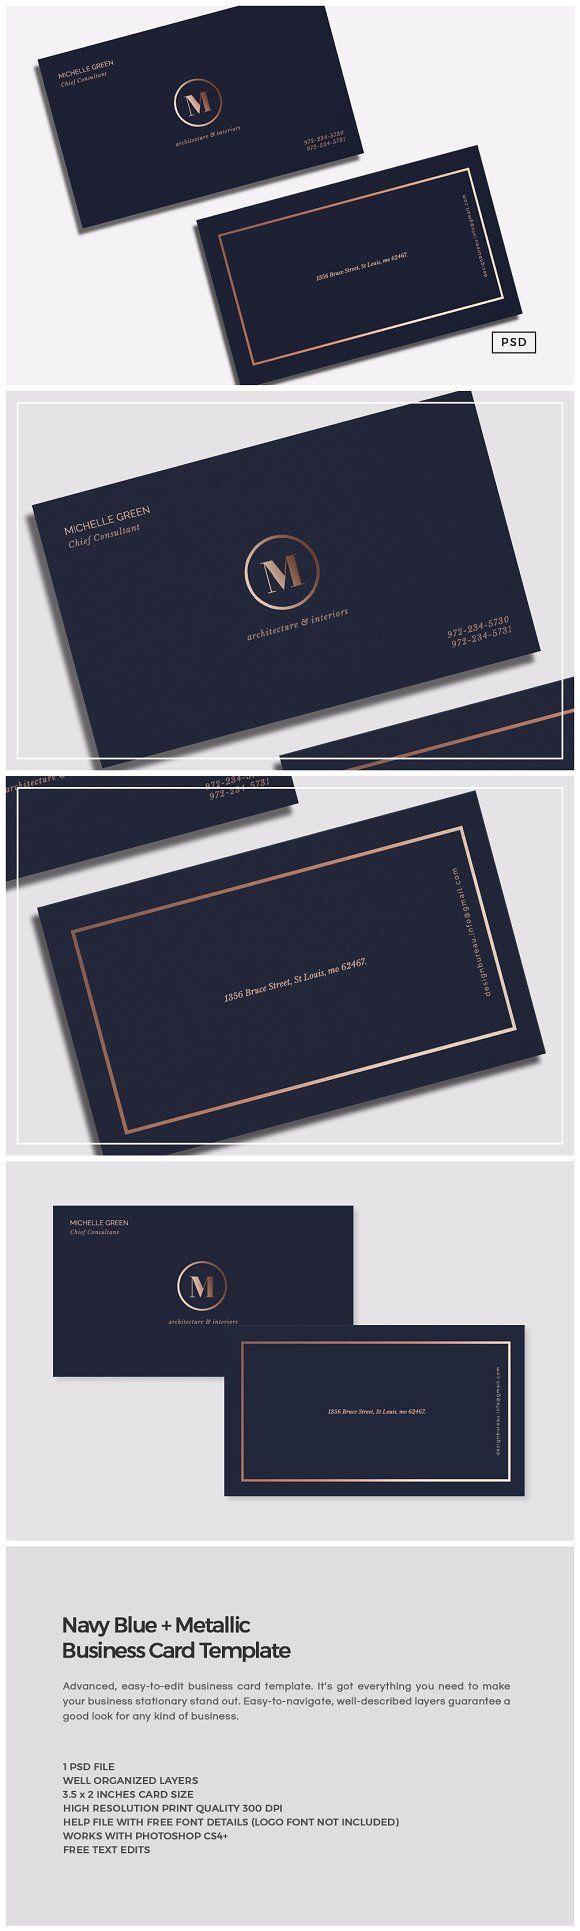 Navy Blue Metallic Business Card   Business cards, Metallic and Navy ...